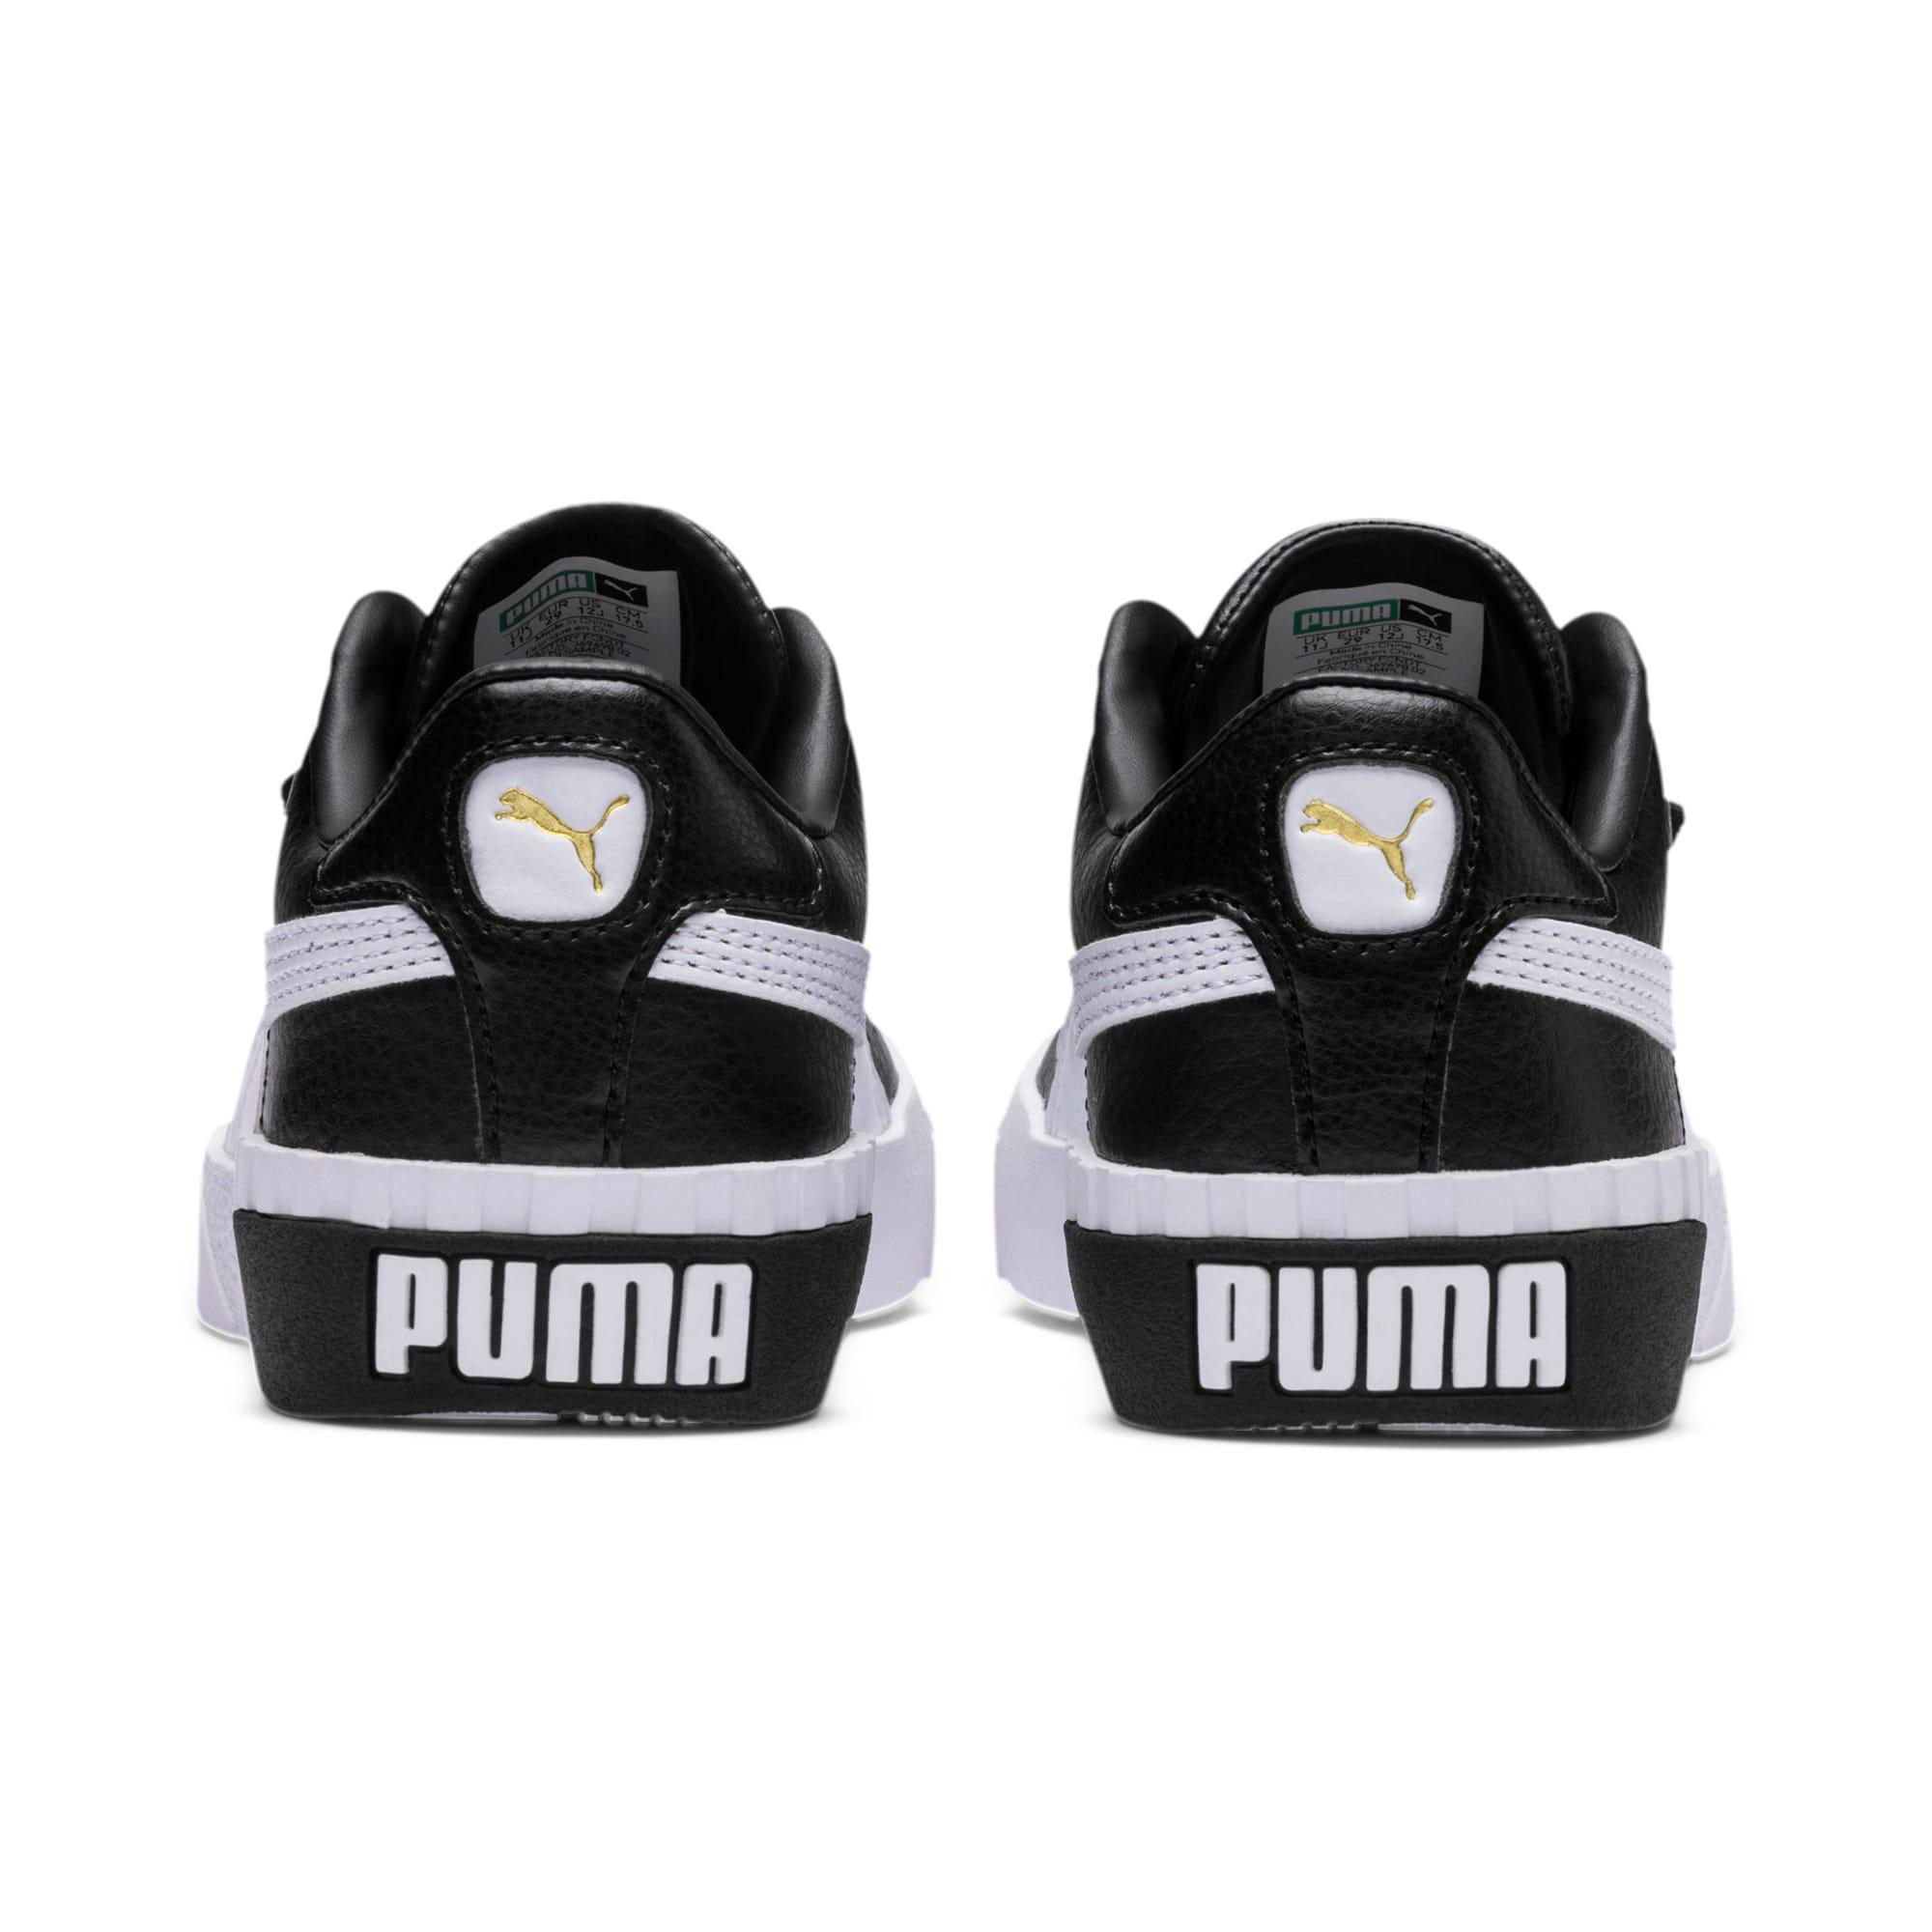 Thumbnail 3 of Cali Little Kids' Shoes, Puma Black-Puma Team Gold, medium